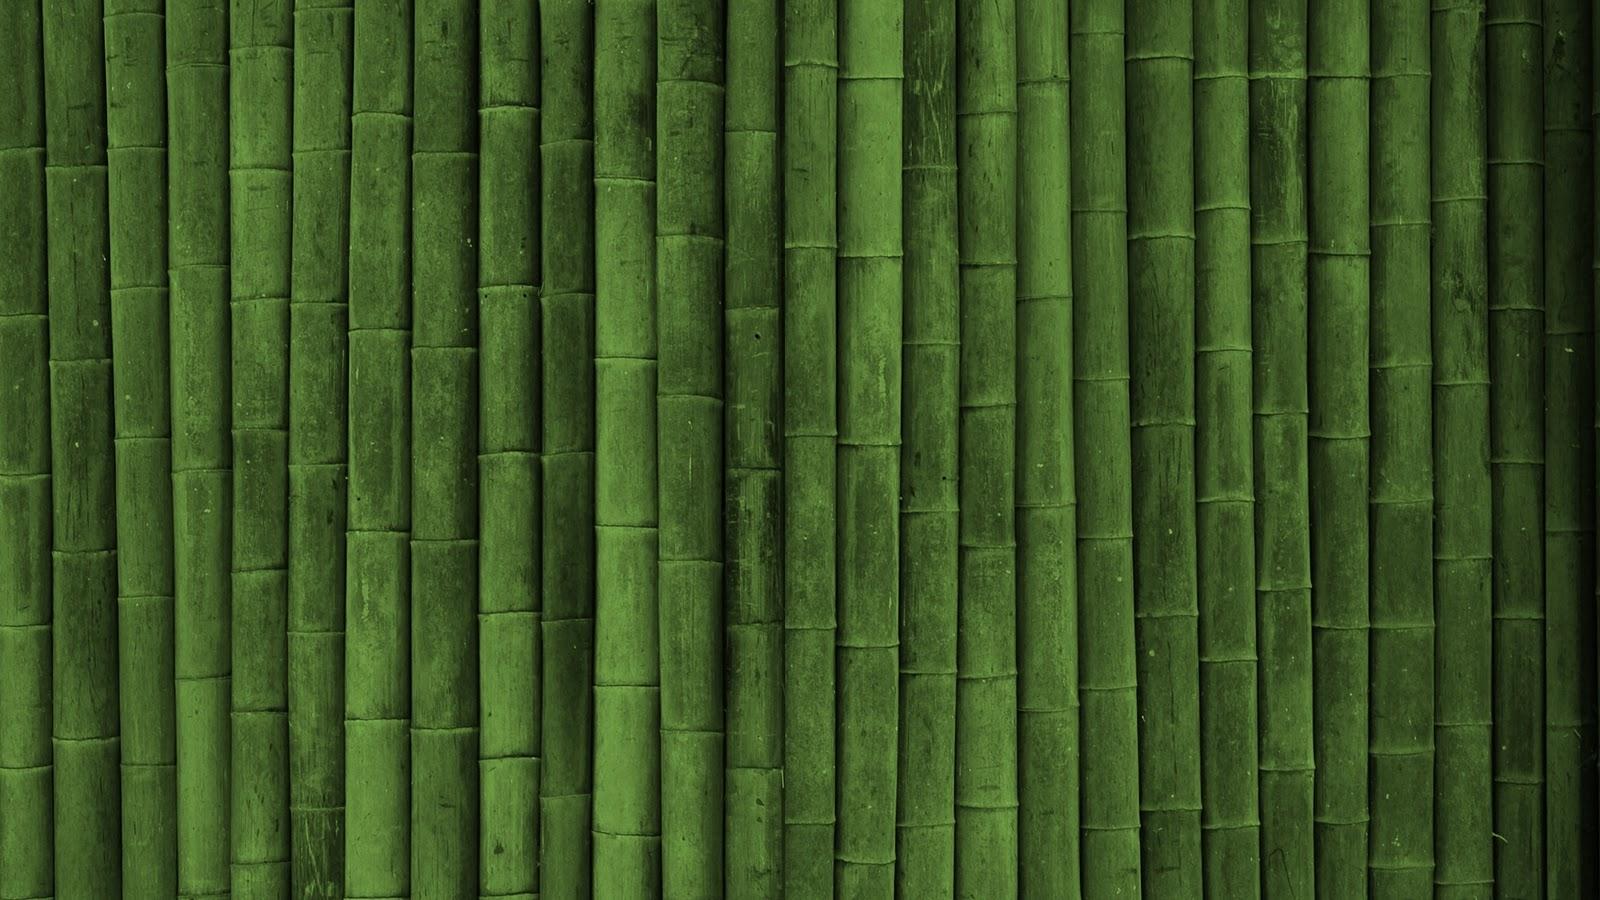 Beautifull Bamboo Green Wall HD Wallpapers Epic Desktop Backgrounds 1600x900